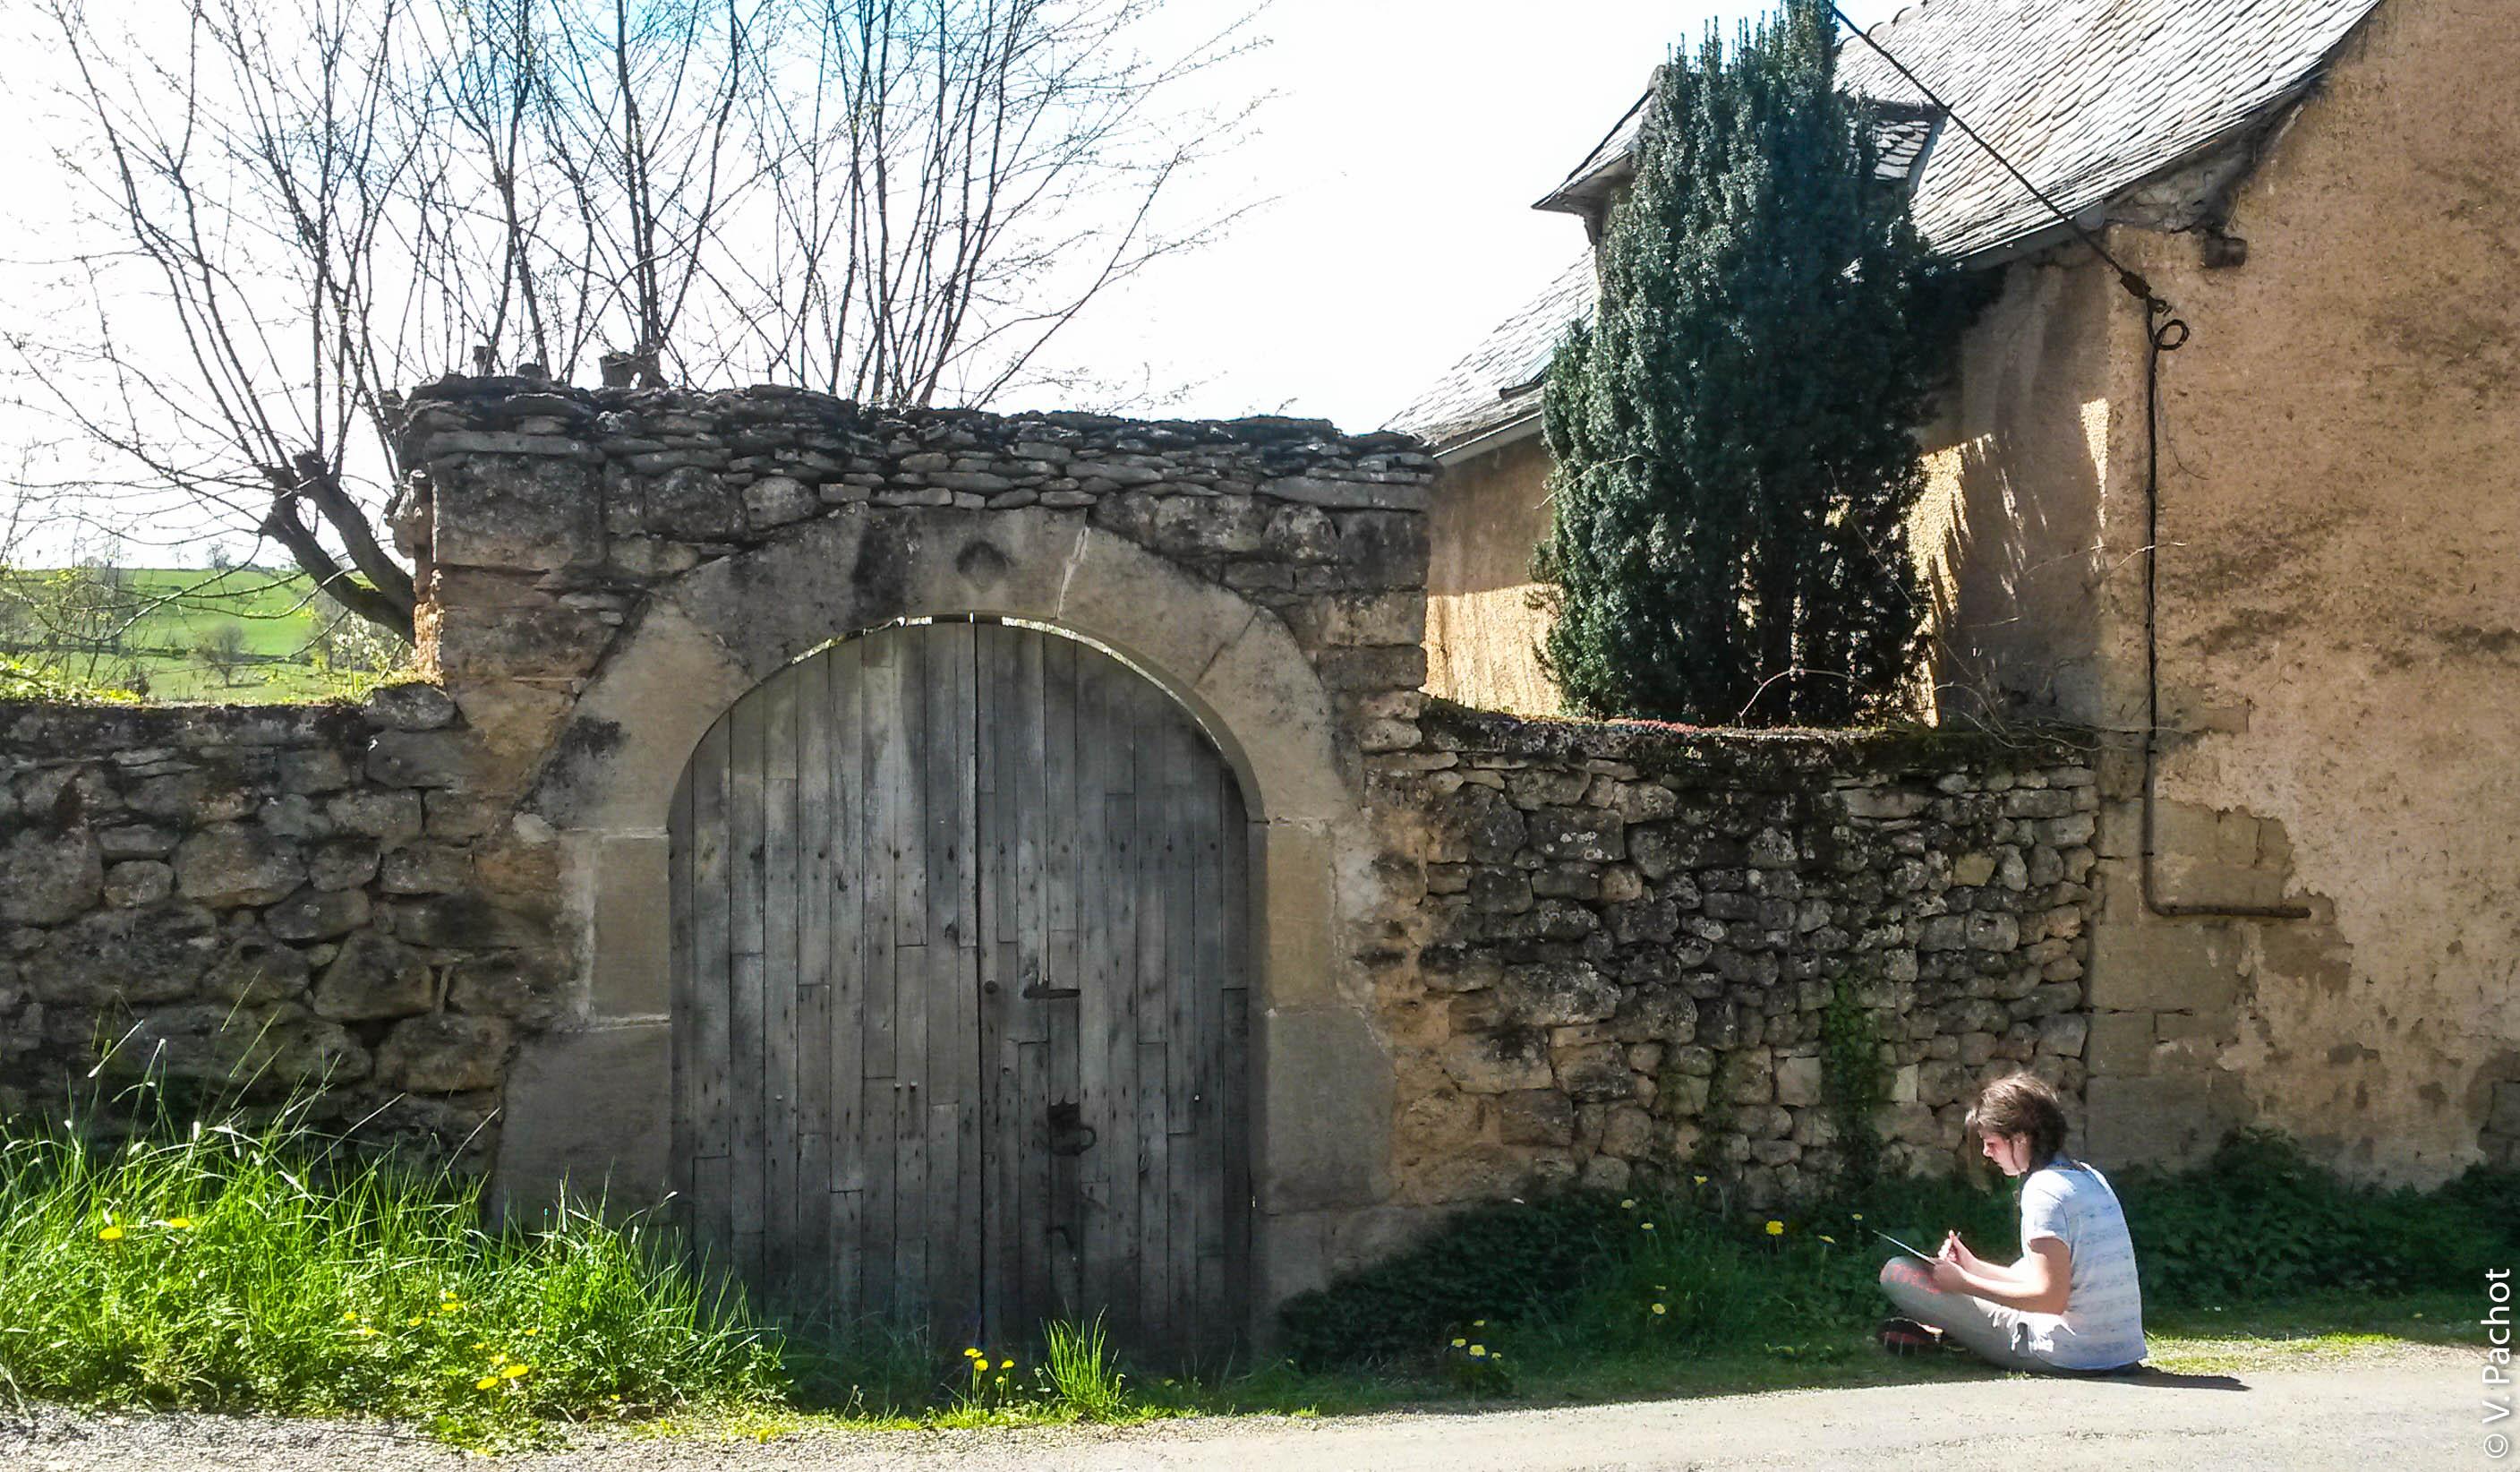 Rando Croquis en Aveyron © V. Pachot